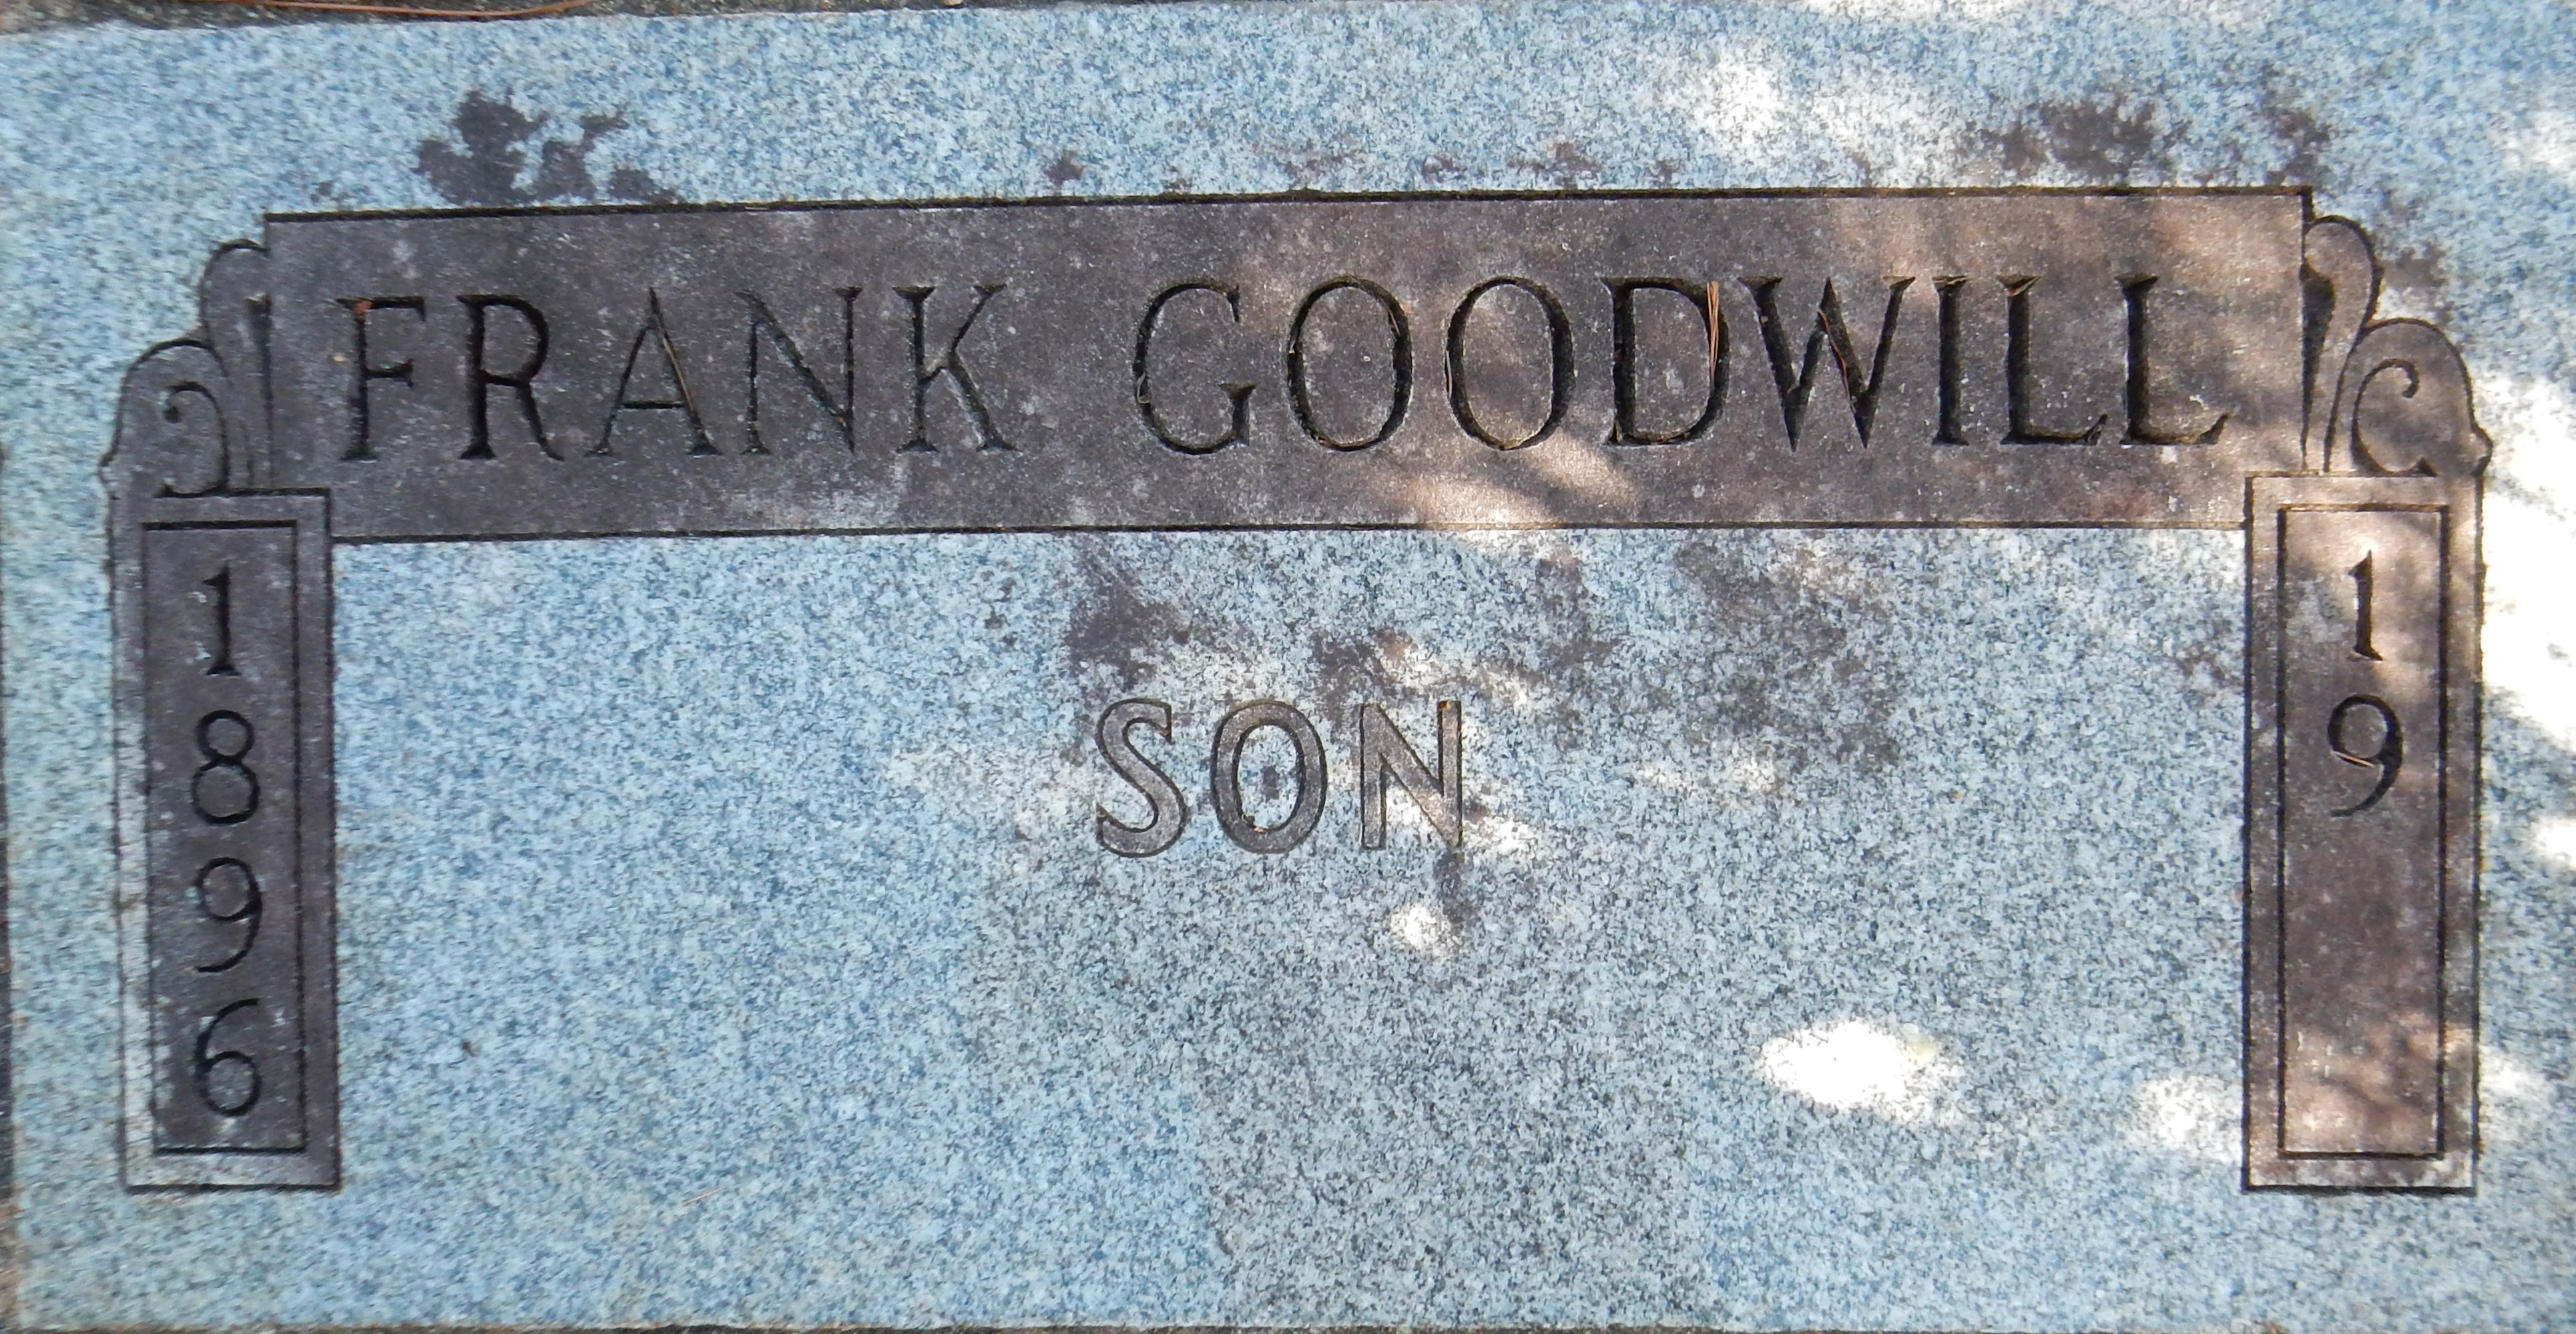 Frank Goodwill